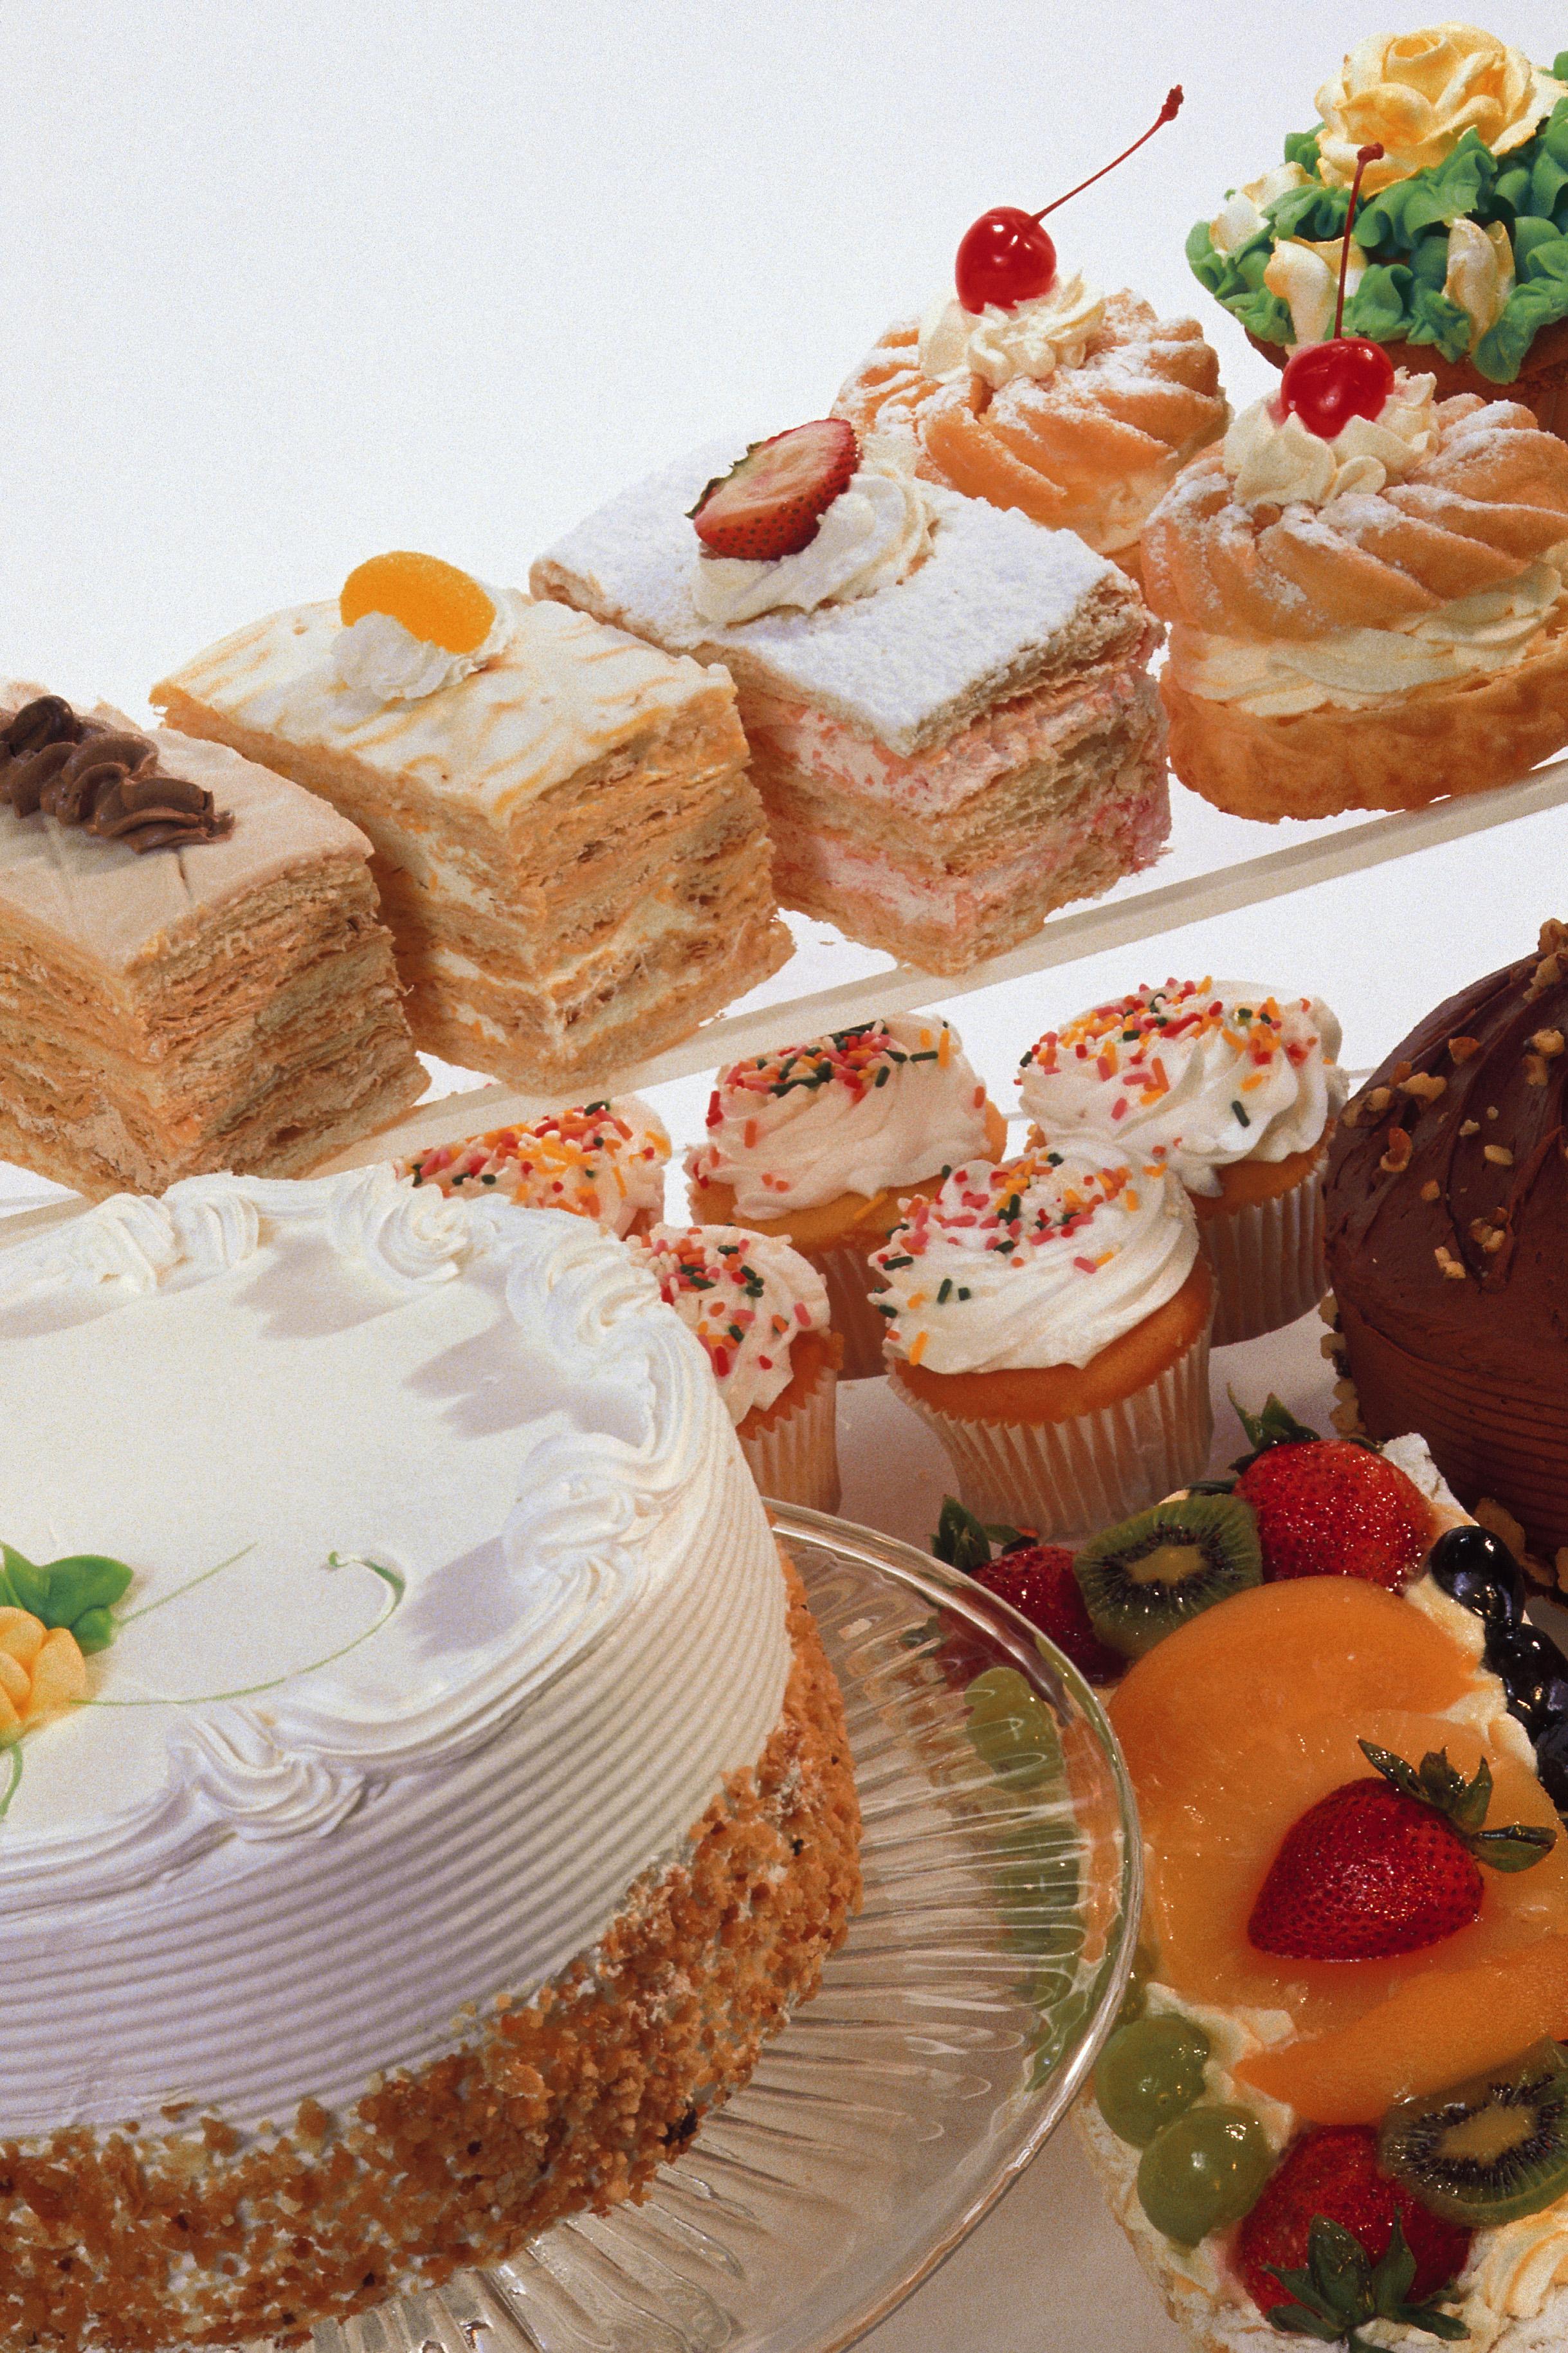 Most Profitable Concession Stand Foods | Bizfluent